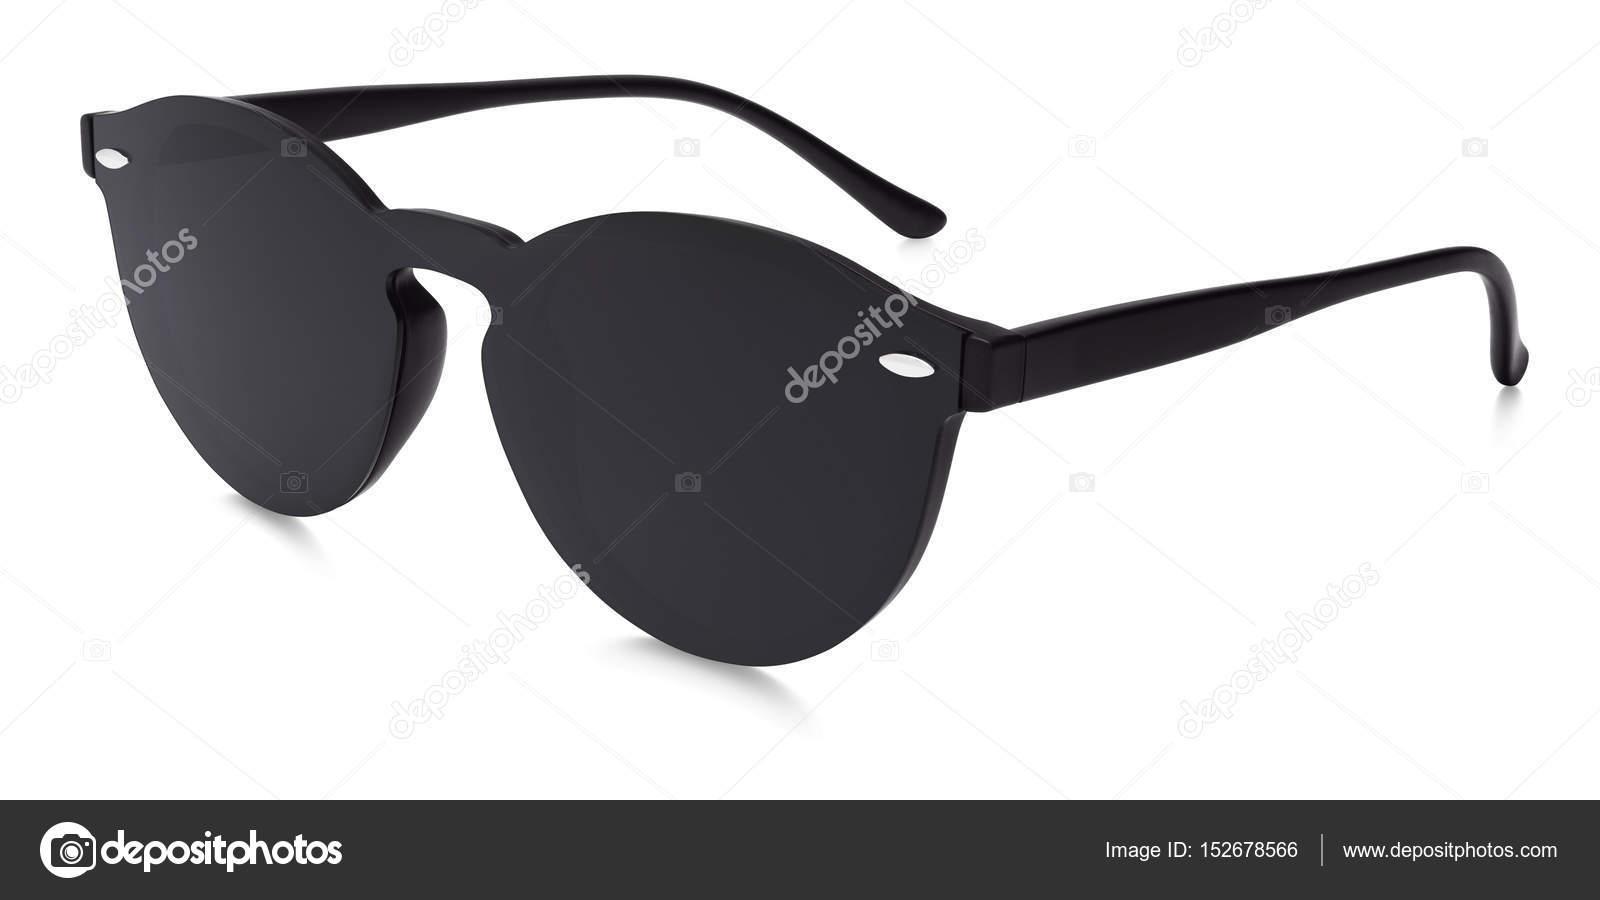 2132ad2654 Γυαλιά ηλίου μαύρο καθρέφτη φακούς που απομονώνονται σε λευκό φόντο– εικόνα  αρχείου